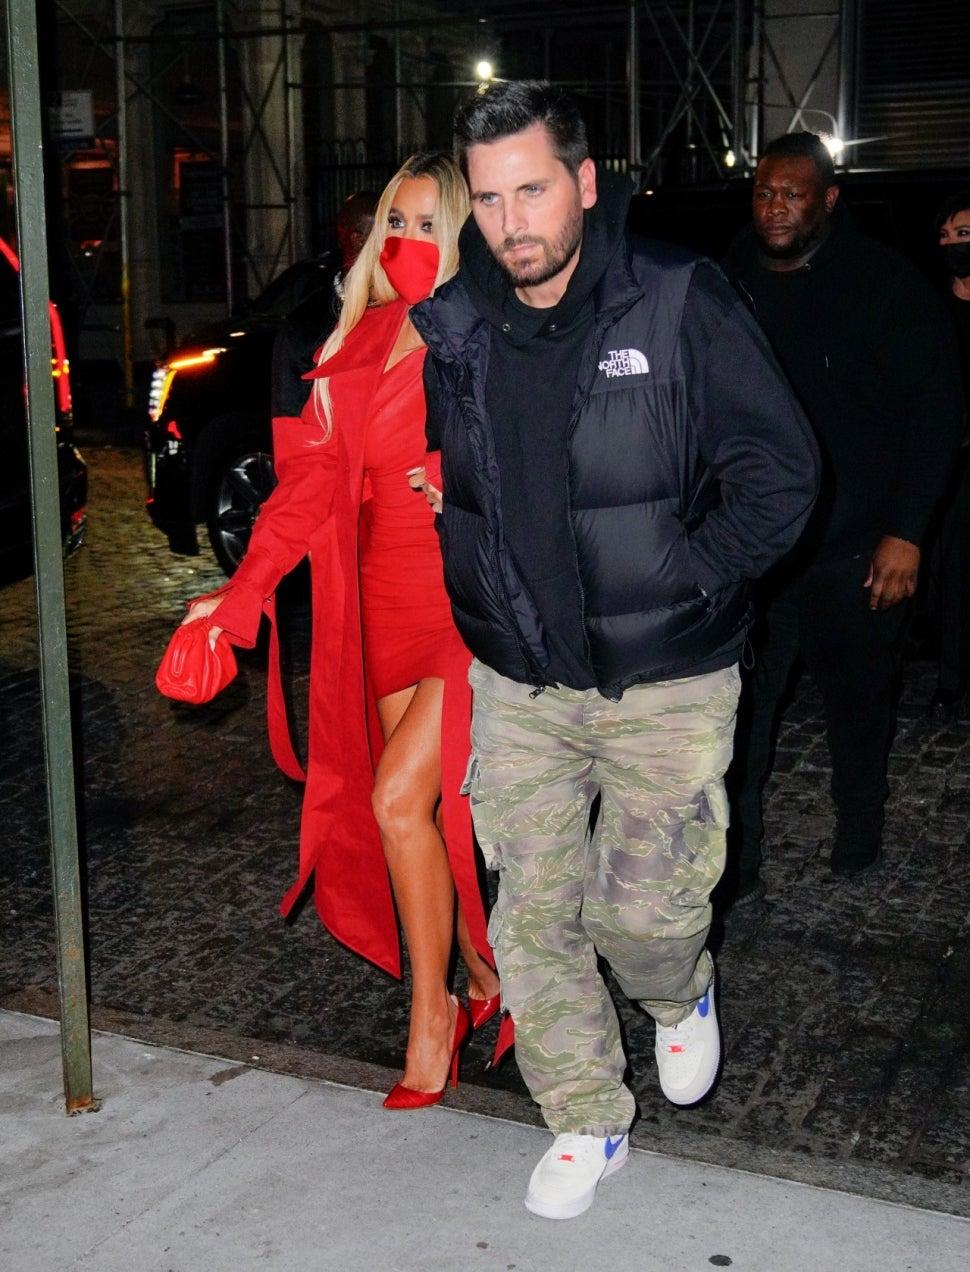 Khloe Kardashian and Scott Disick